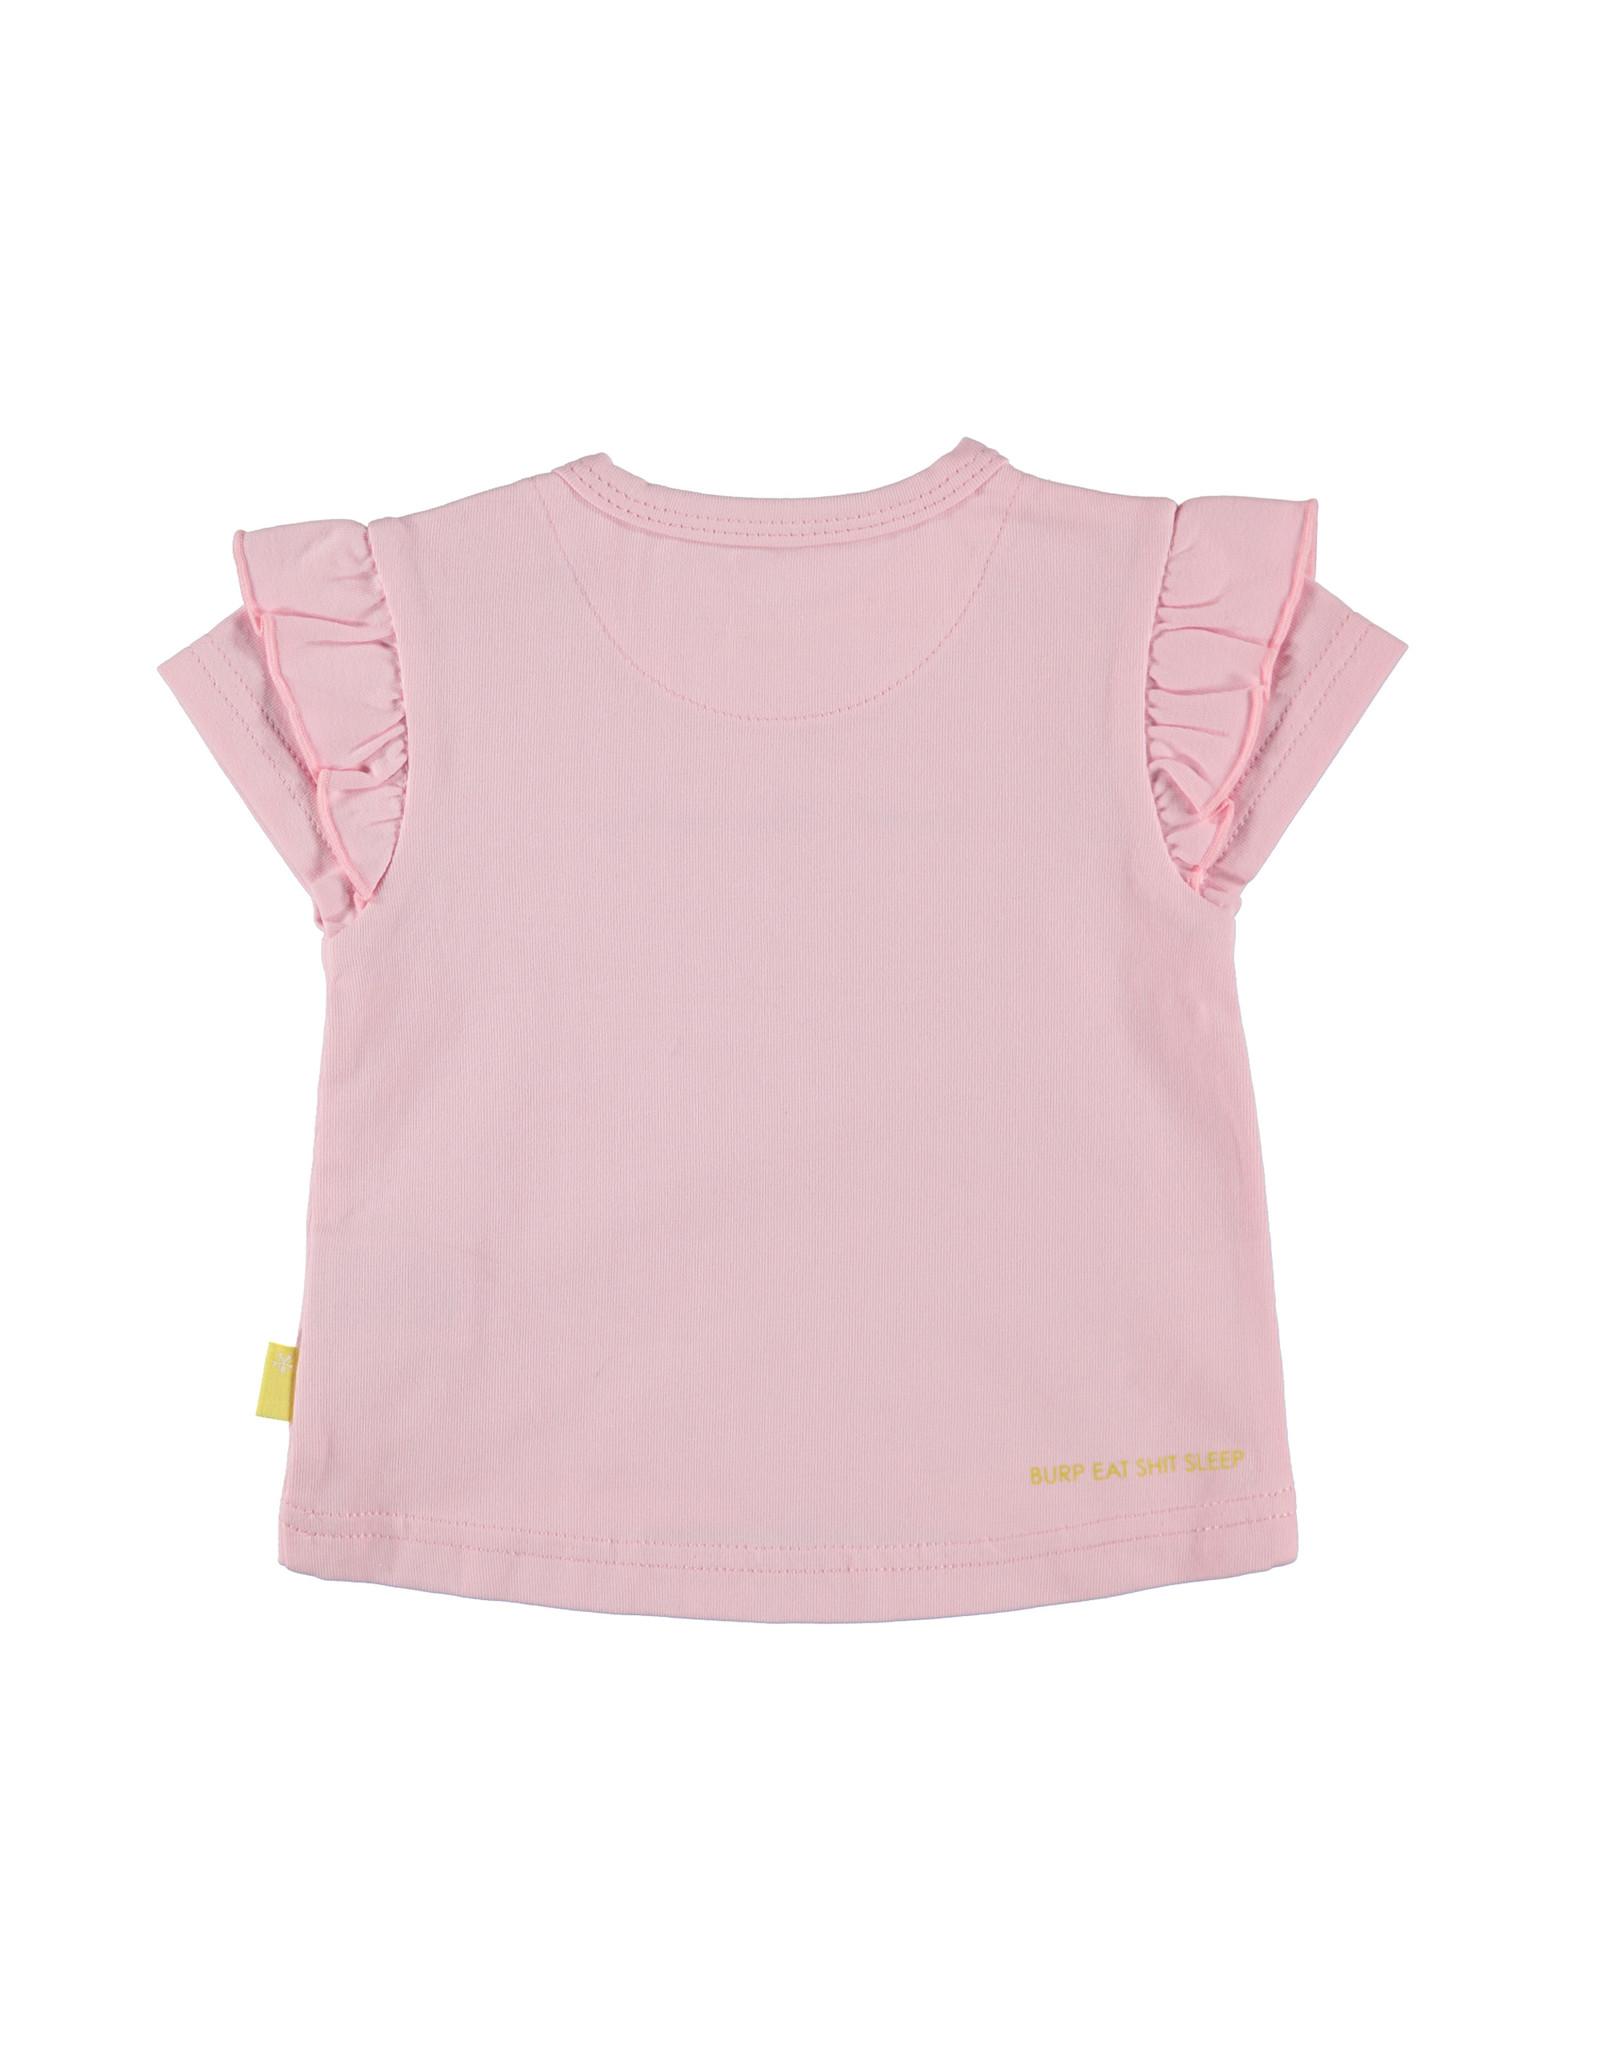 B.E.S.S. Shirt sh.sl. Sweet  Like Melon, Pink